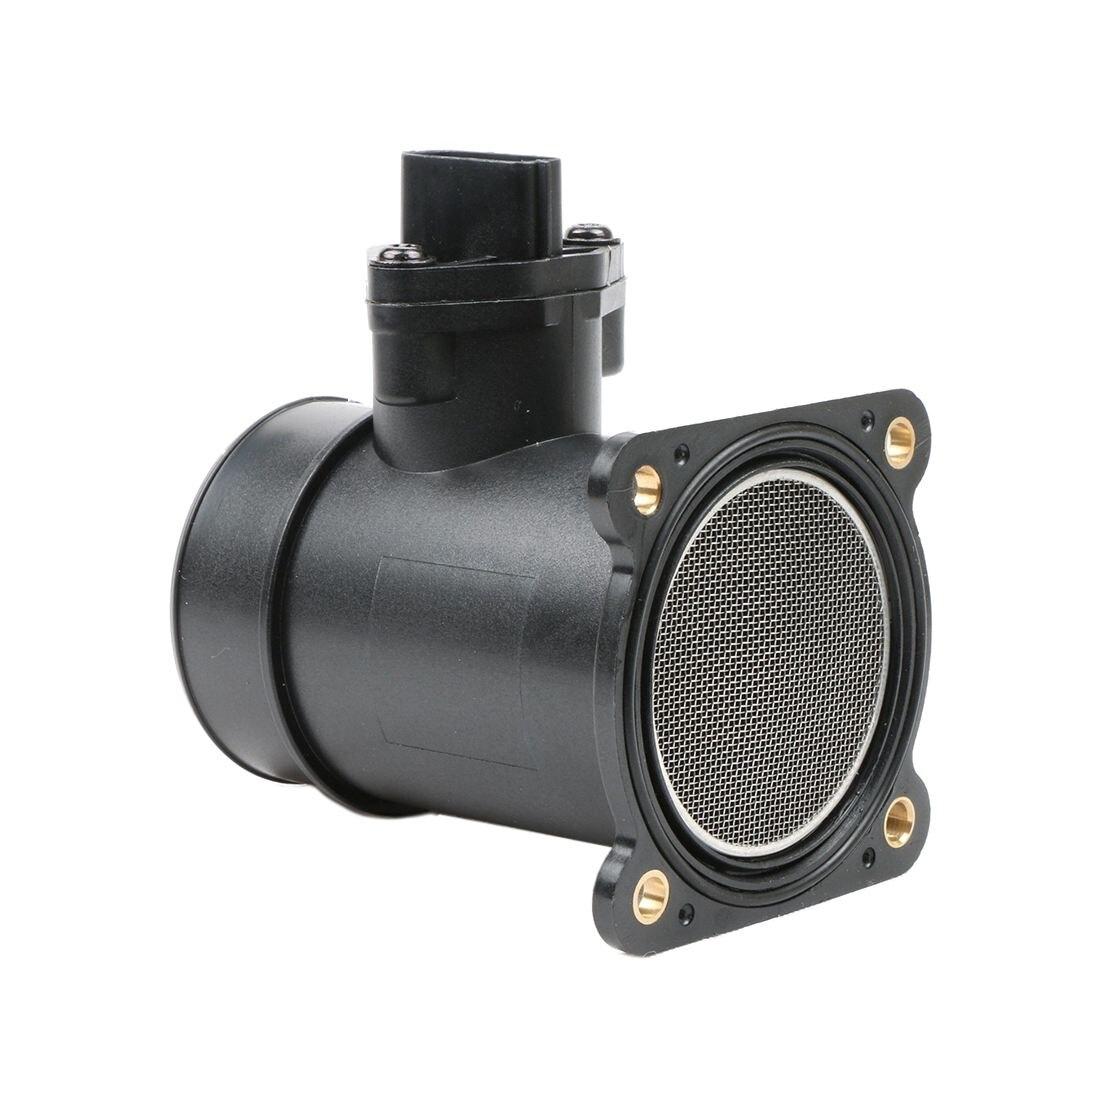 High Quality New Mass Air Flow Sensor Meter MAF For 00-02 Sentra 1.8L Replaces 22680-5M000